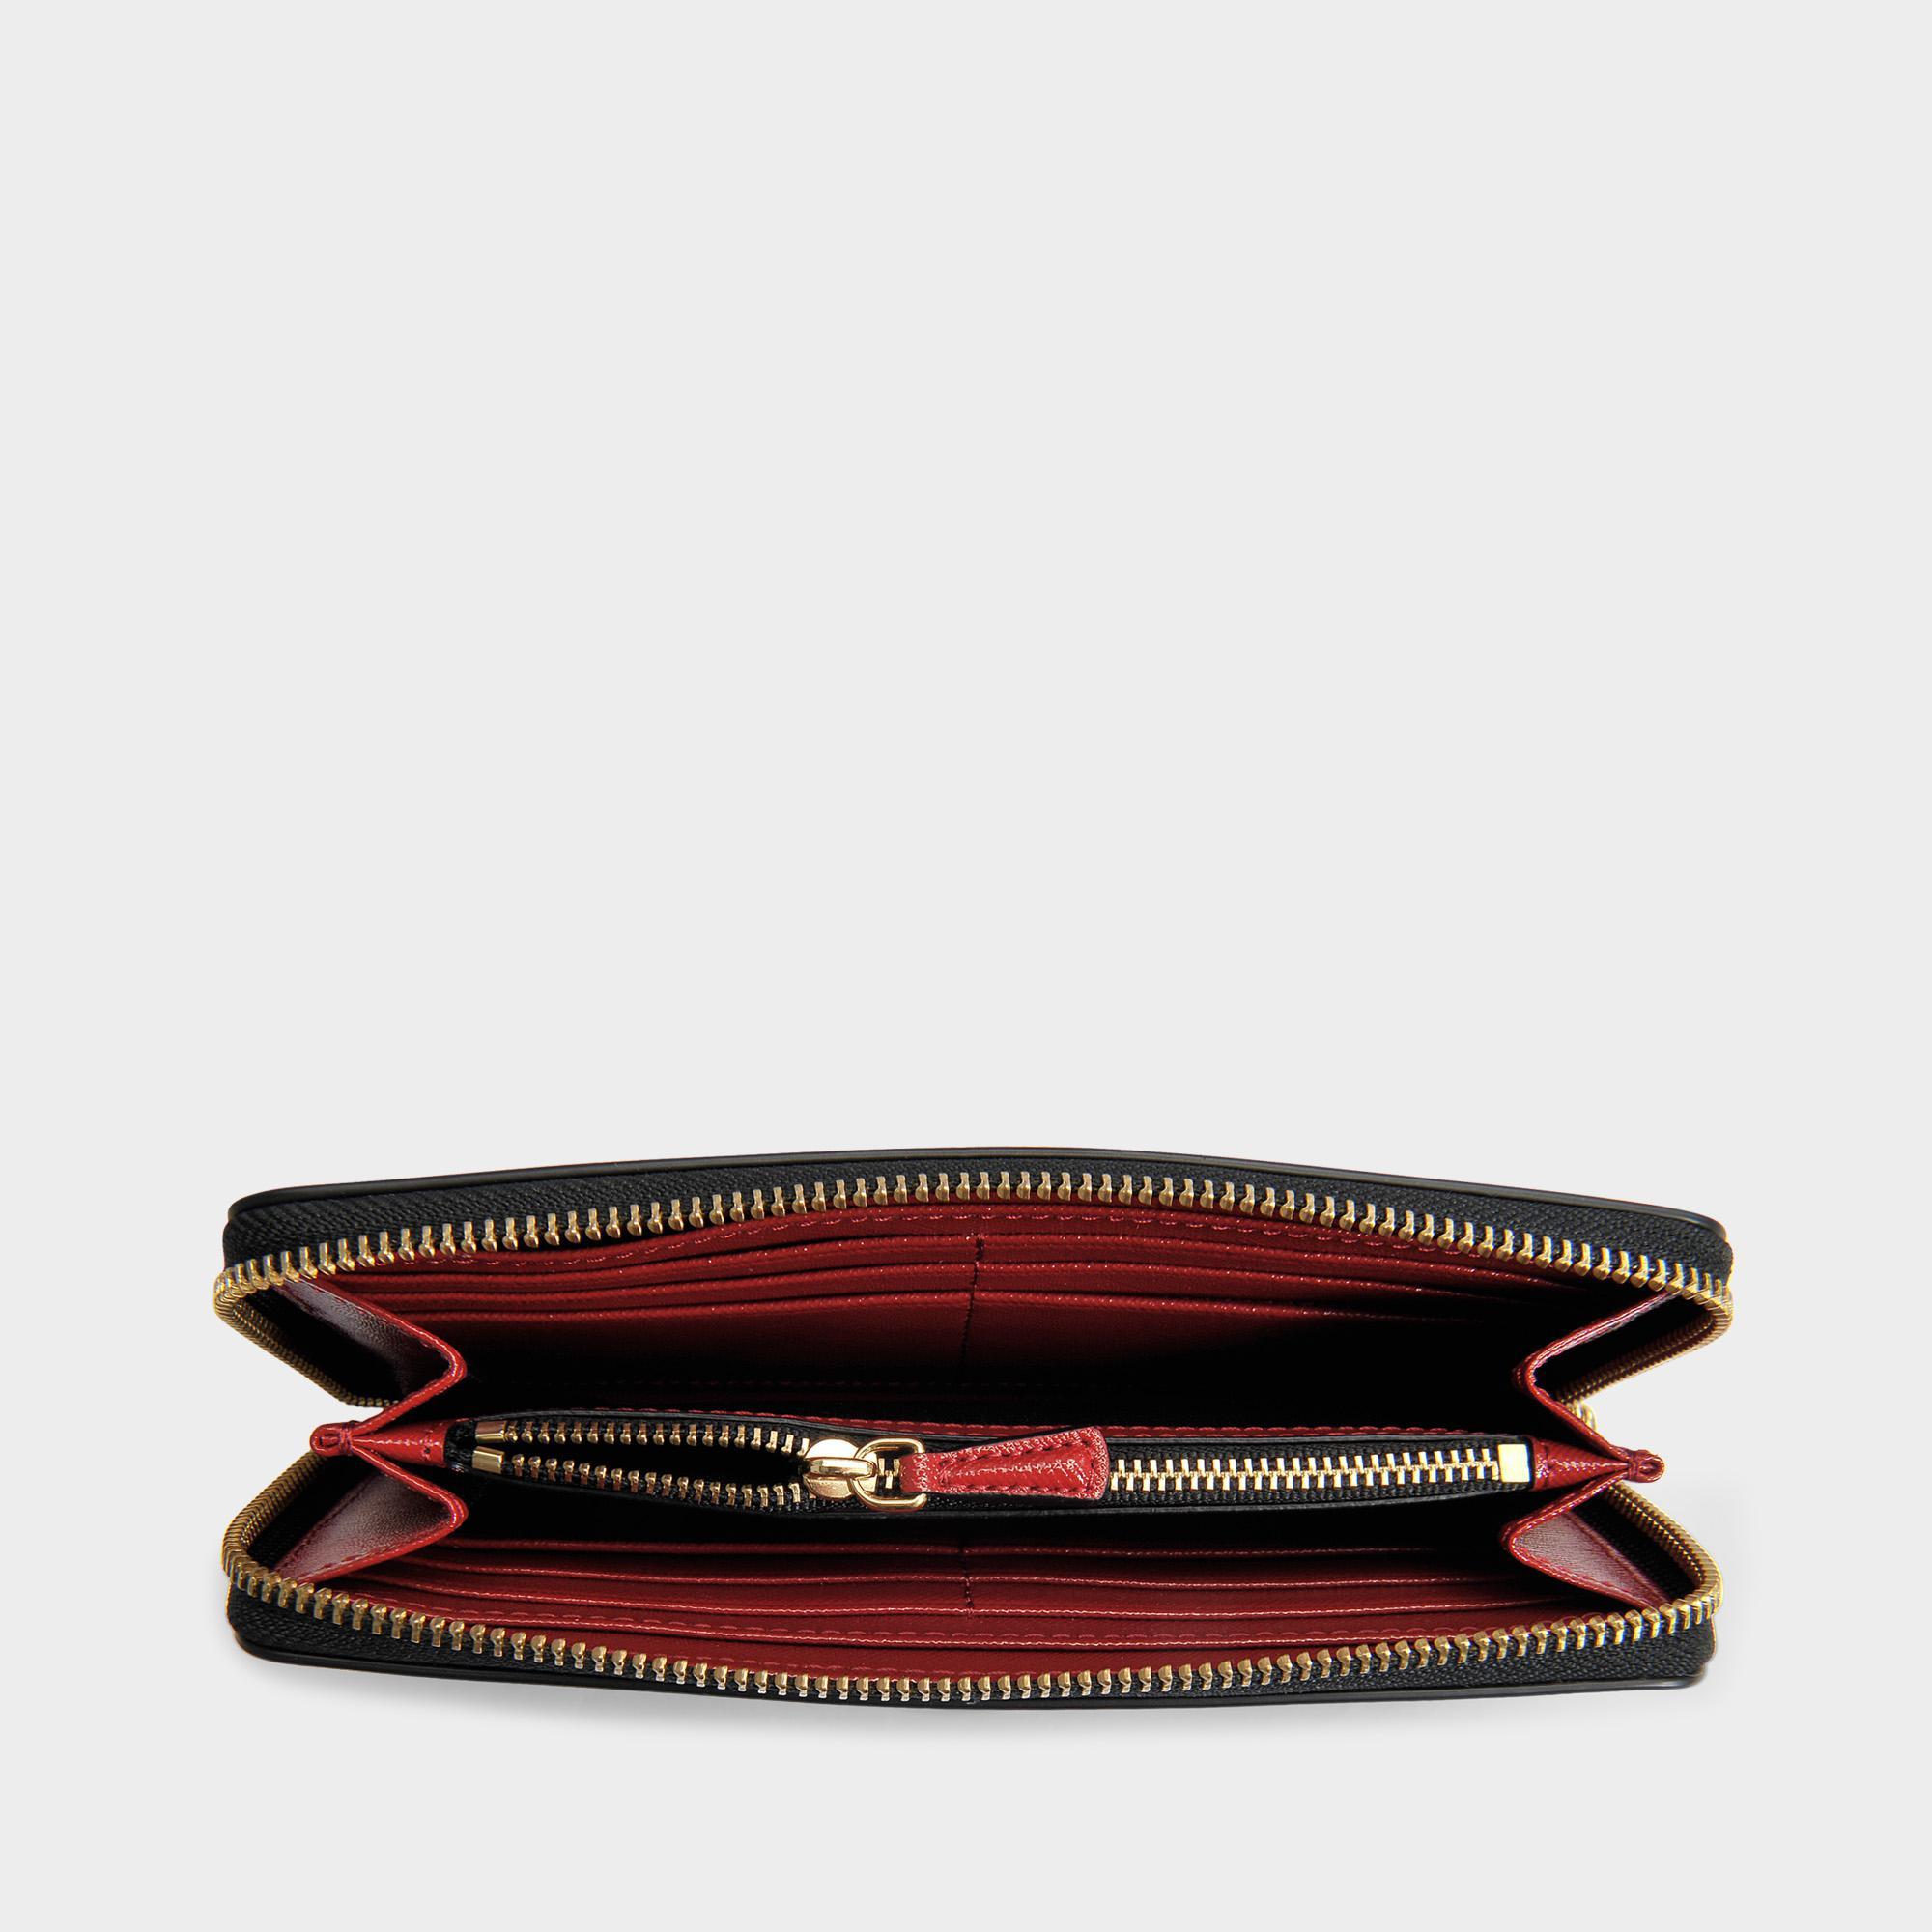 Marc Jacobs Portefeuille Snapshot Standard Continental 7NlQ6Rh